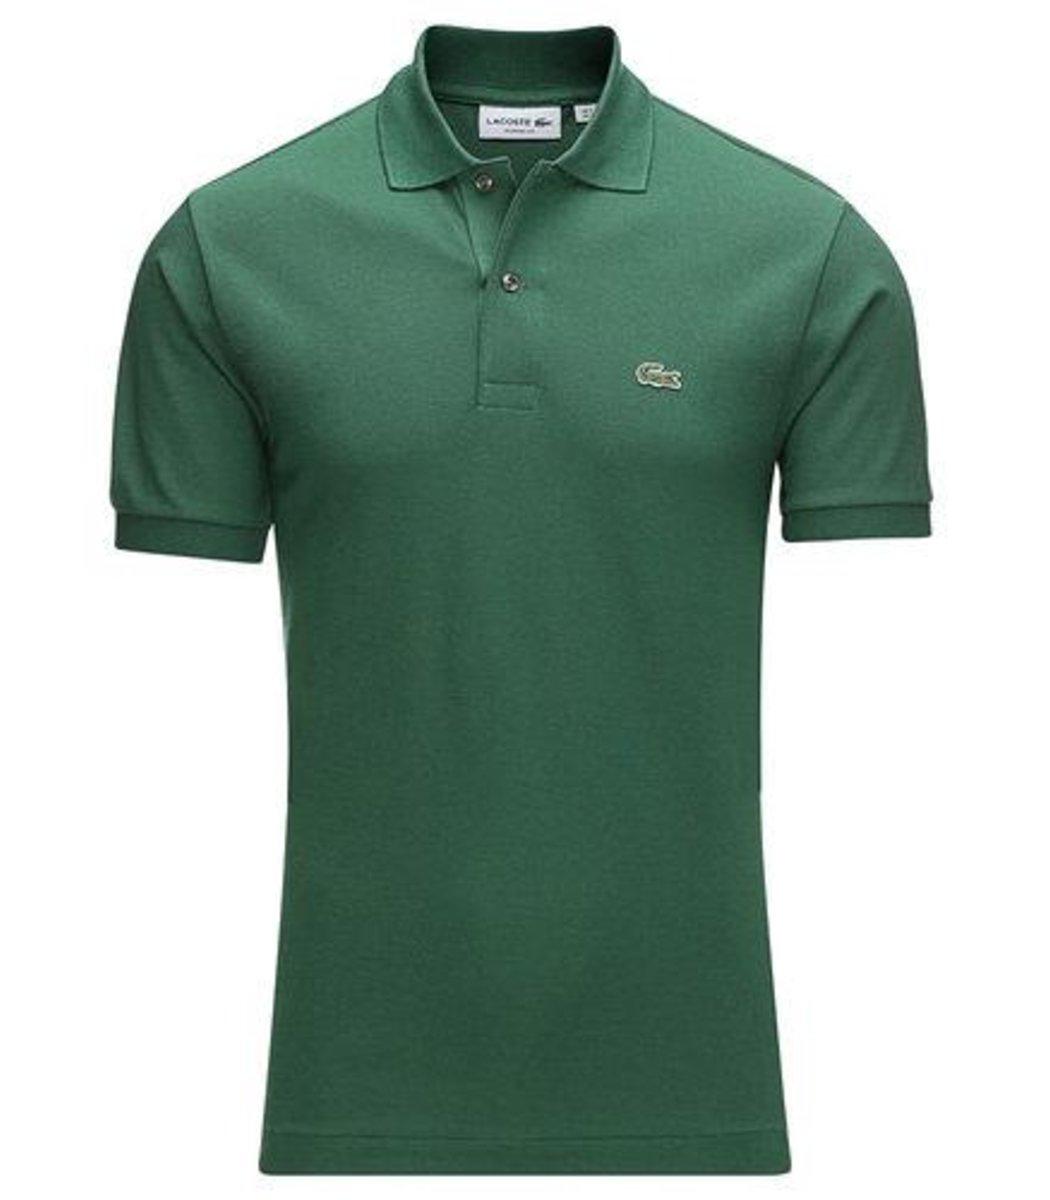 Мужская темно-зеленая футболка поло Lacoste  - темно-зеленый - Вид 1